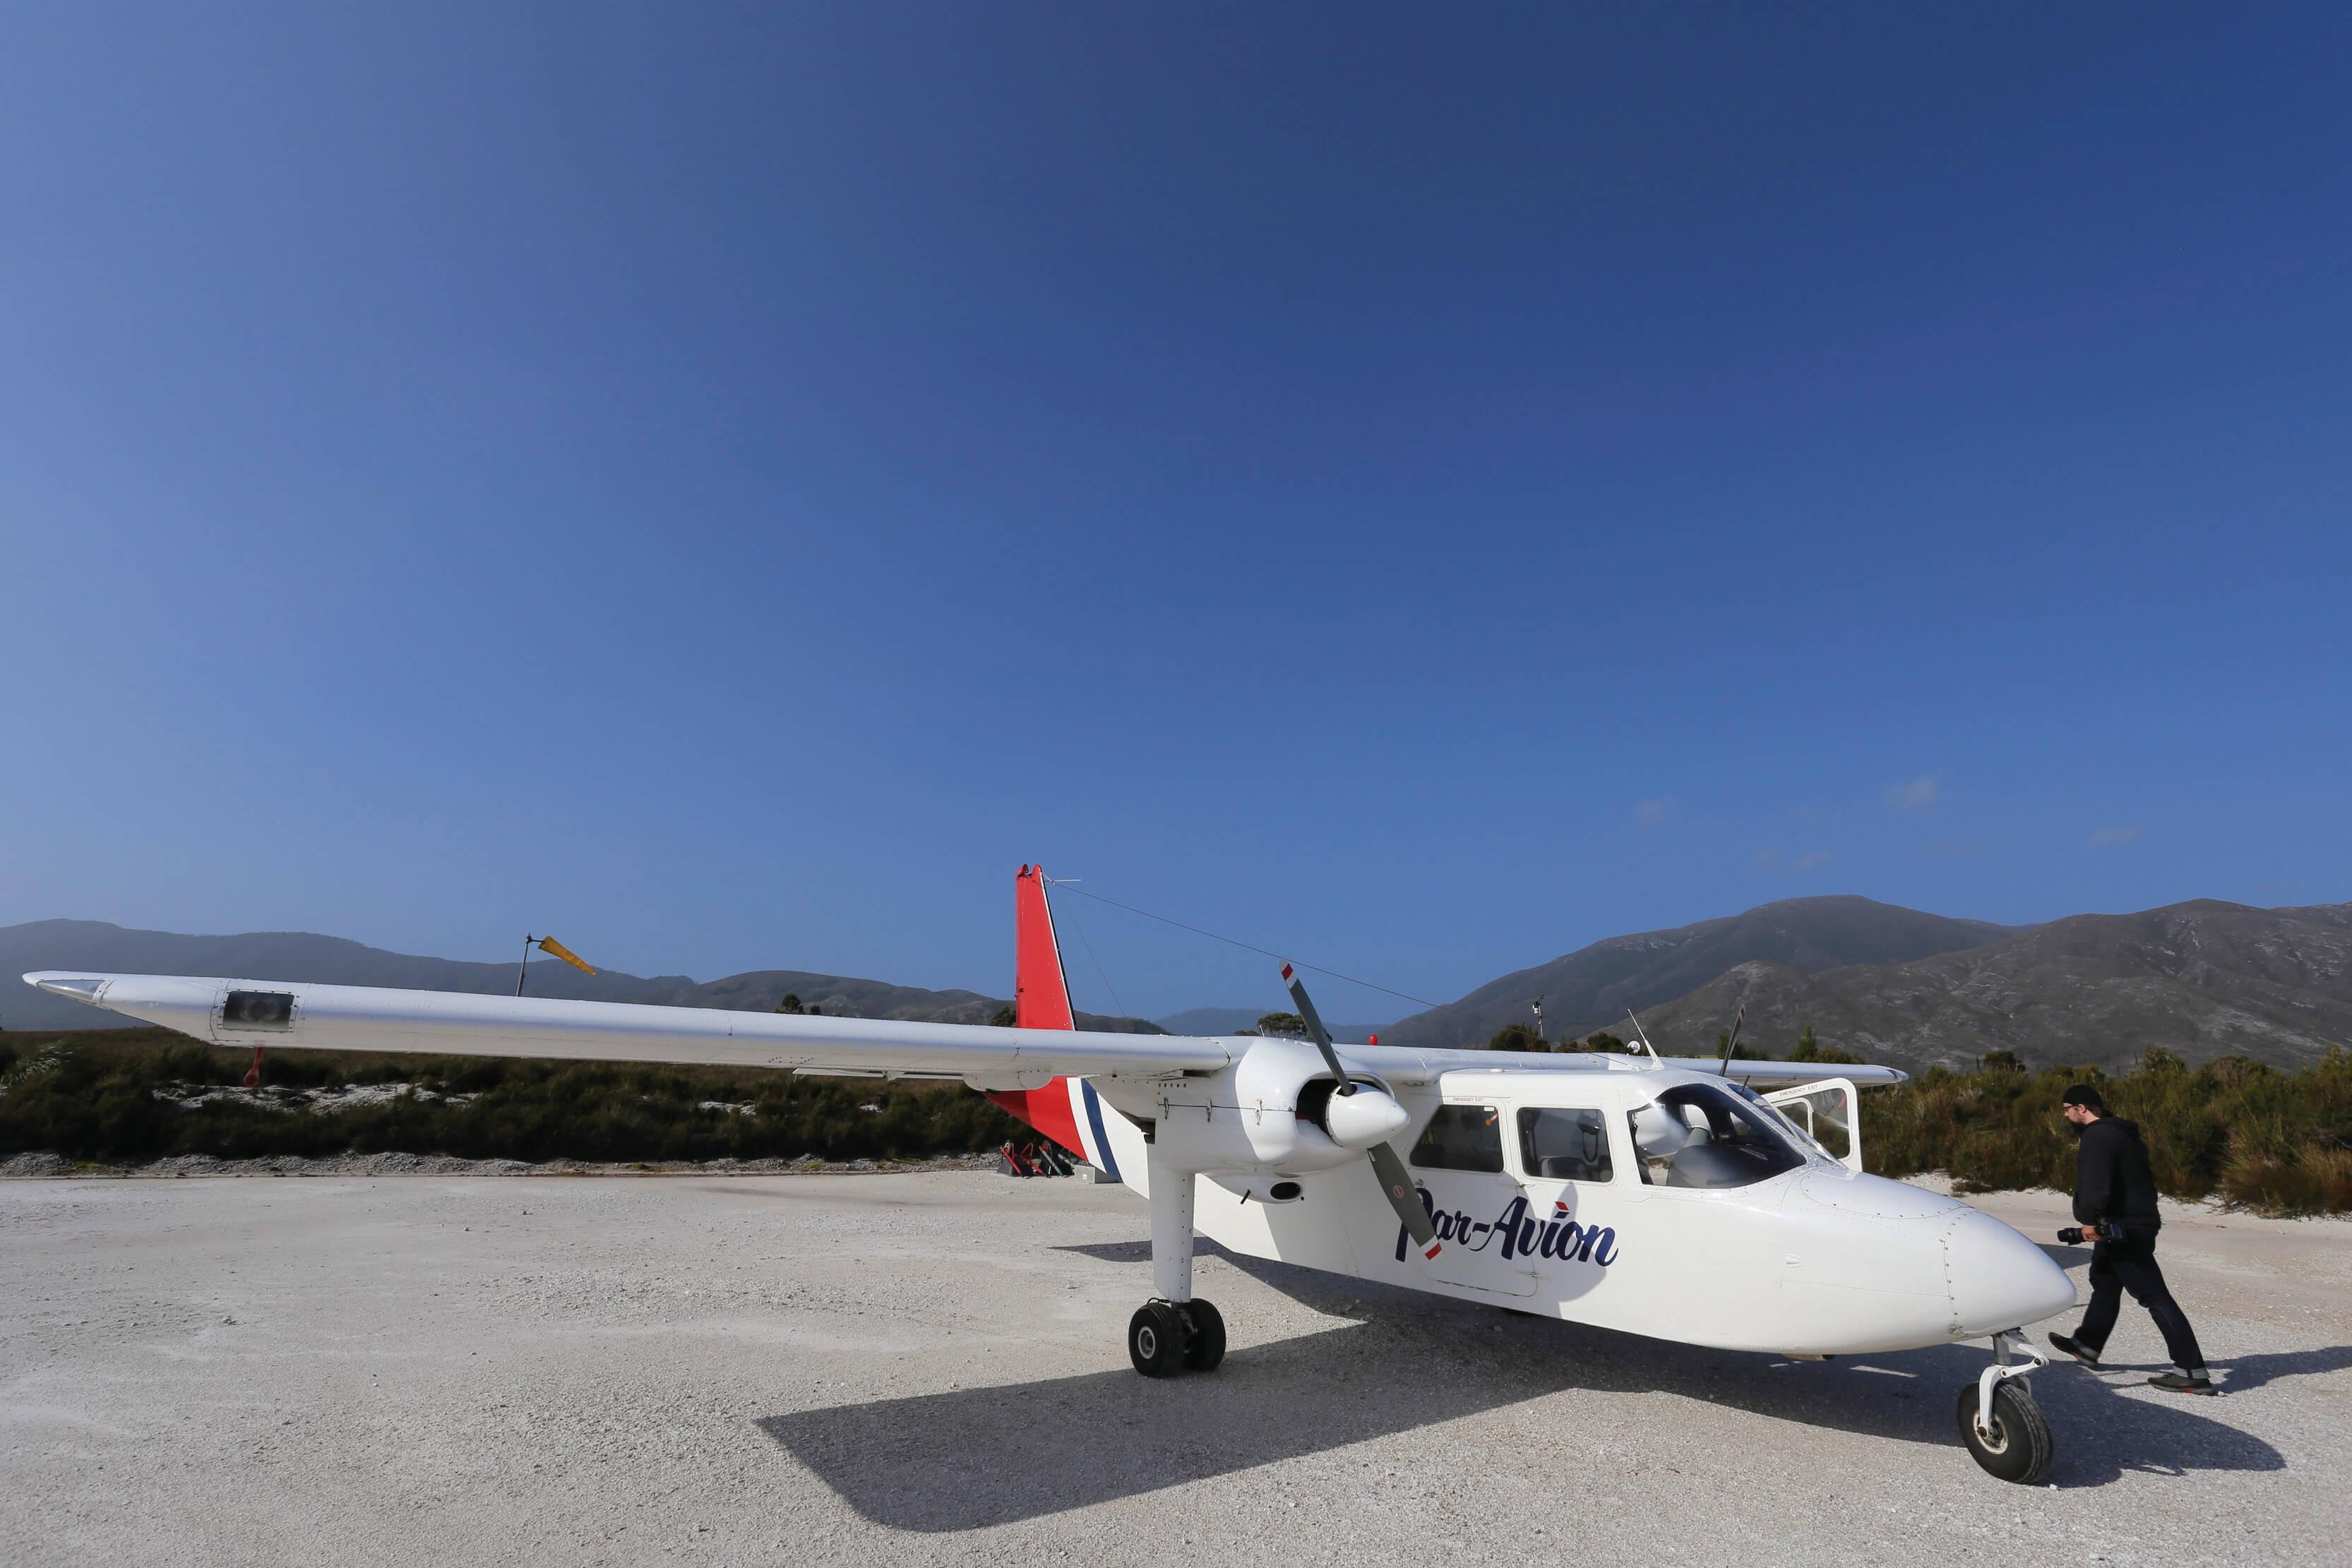 South-Tasmania Southwest-National-Park Melaleuca-airstrip---Par-Avion-Wilderness-Tours-South-West-Half-Day-Tour 124285-2